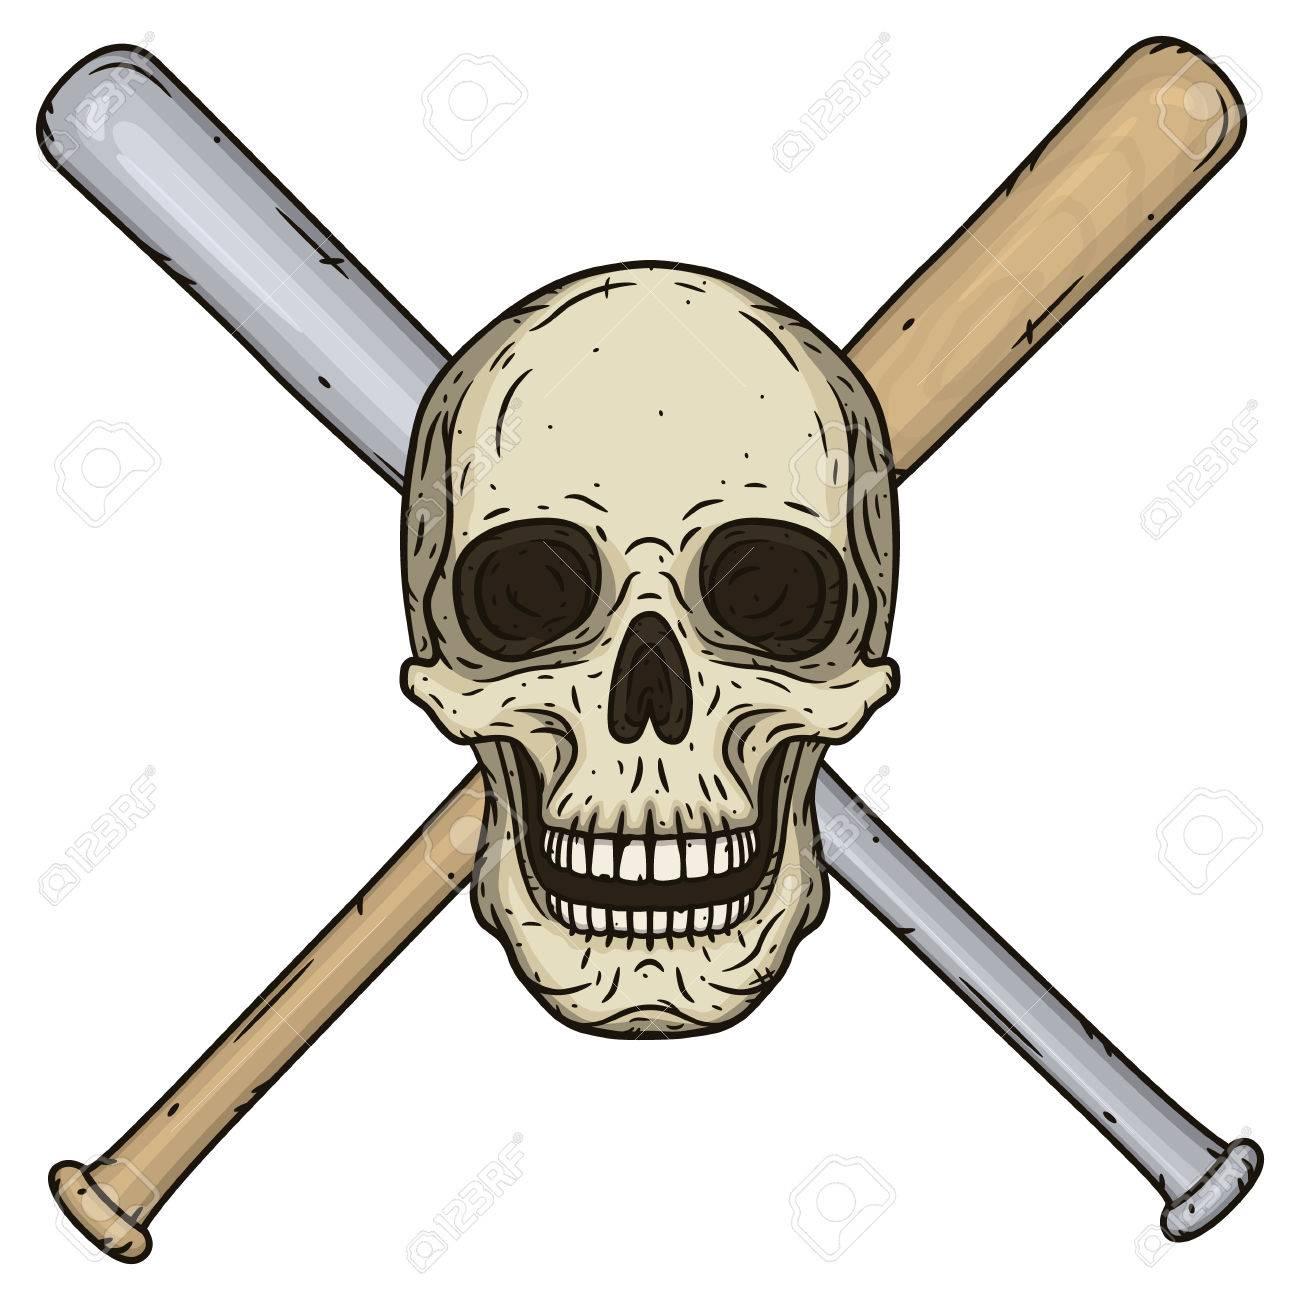 vector illustration of human skull with crossed baseball bats rh 123rf com Baseball Bat Wrapped in Barbed Wire Animated Baseball Bat